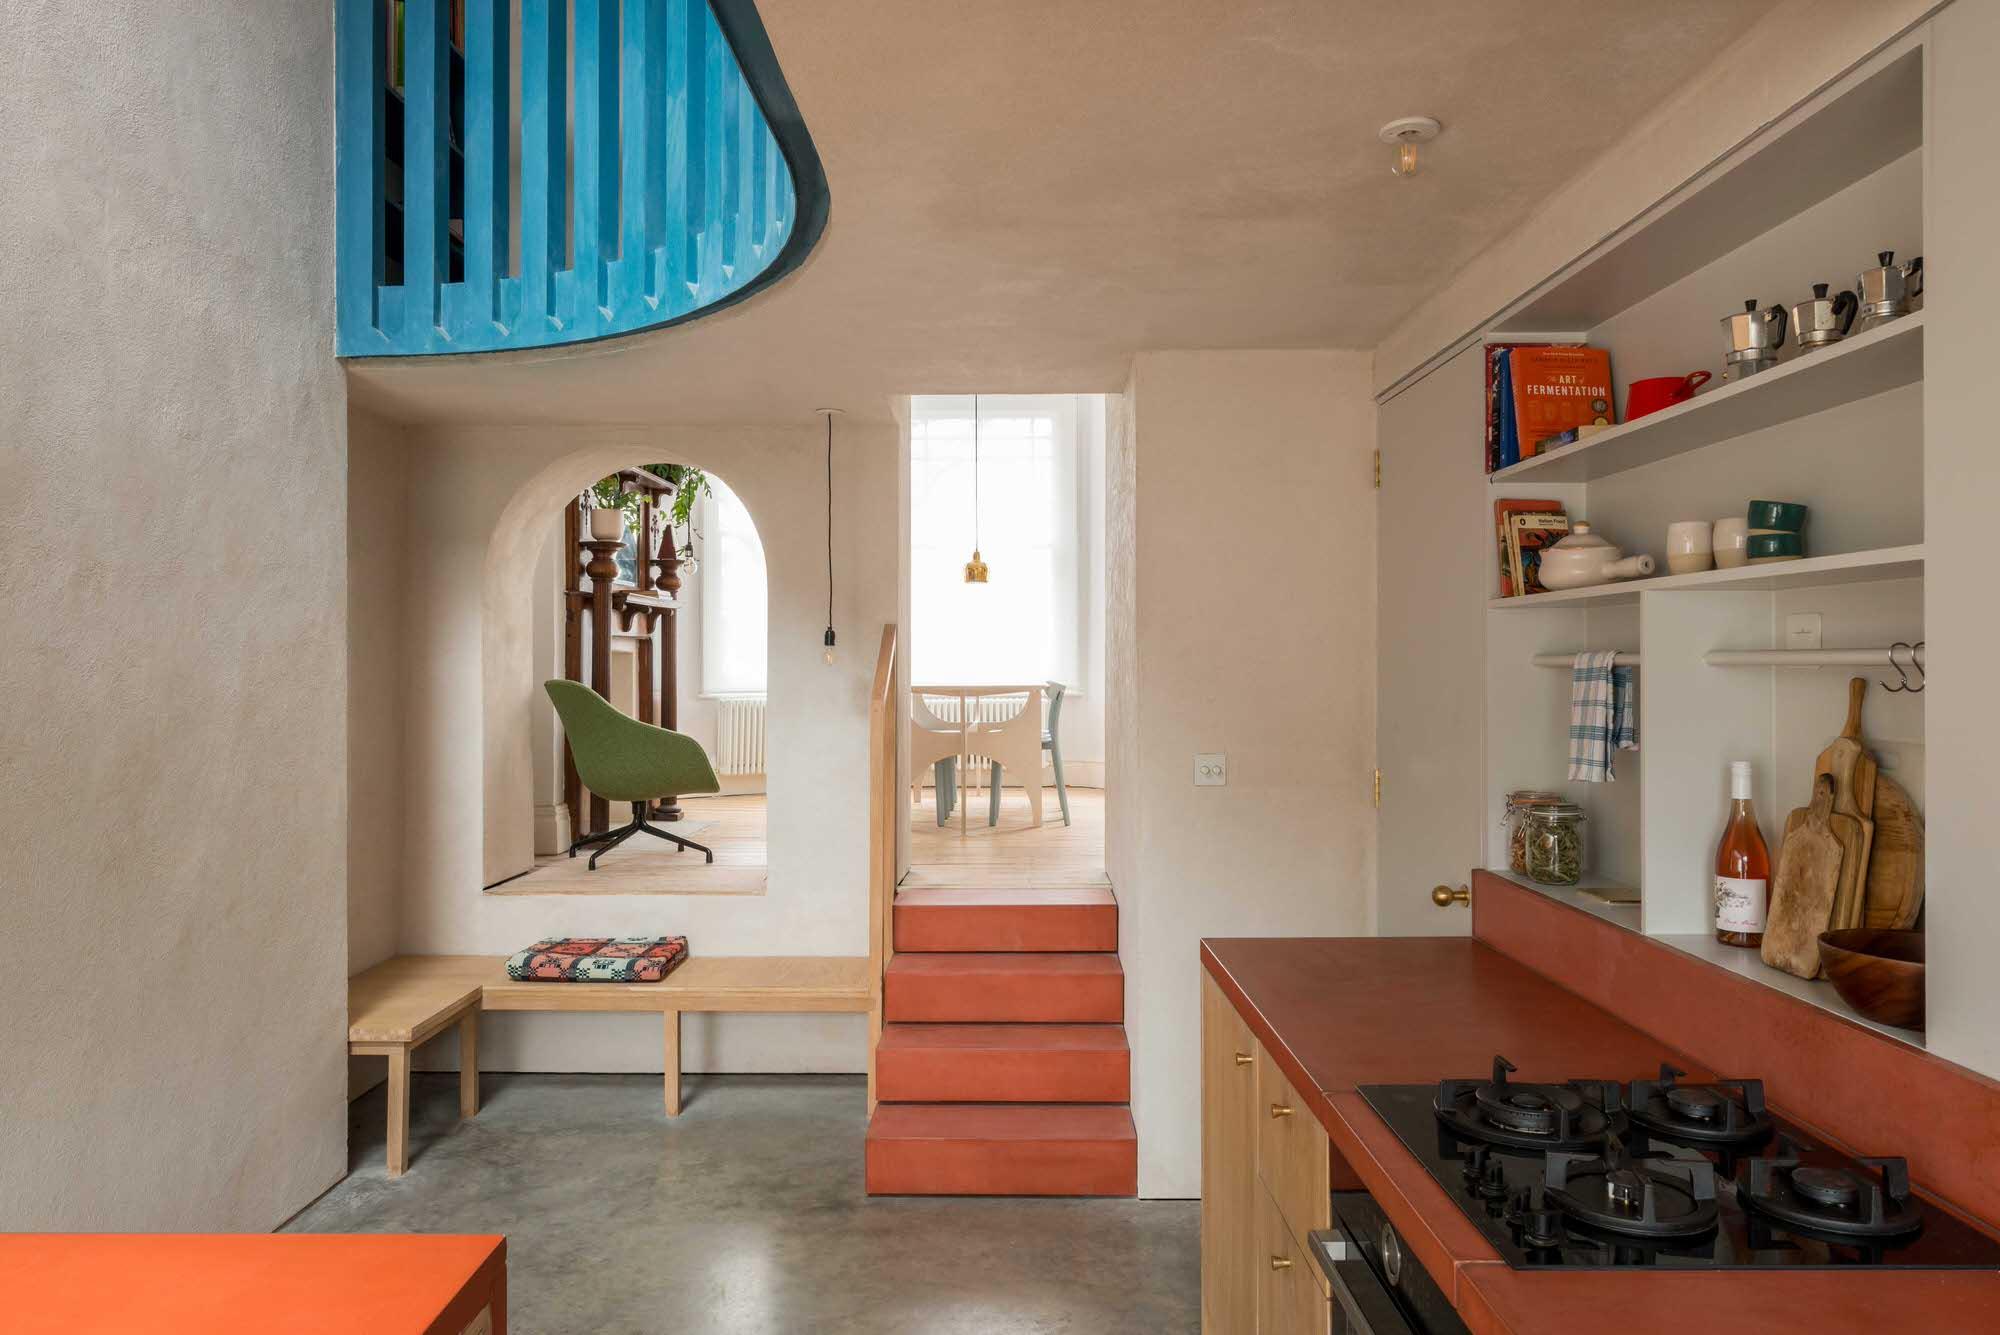 Studio Ben Allen House Recast London Residential Architecture Photo French+tye Yellowtrace 20